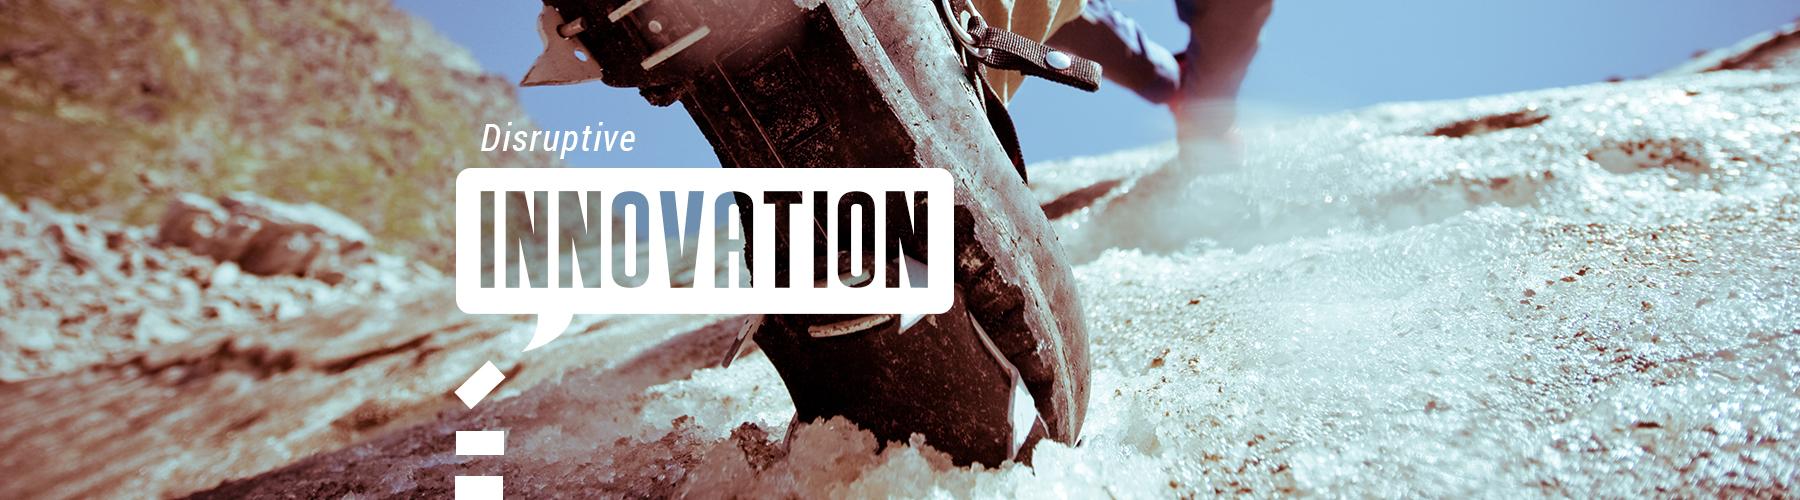 03-Disruptive-Innovation